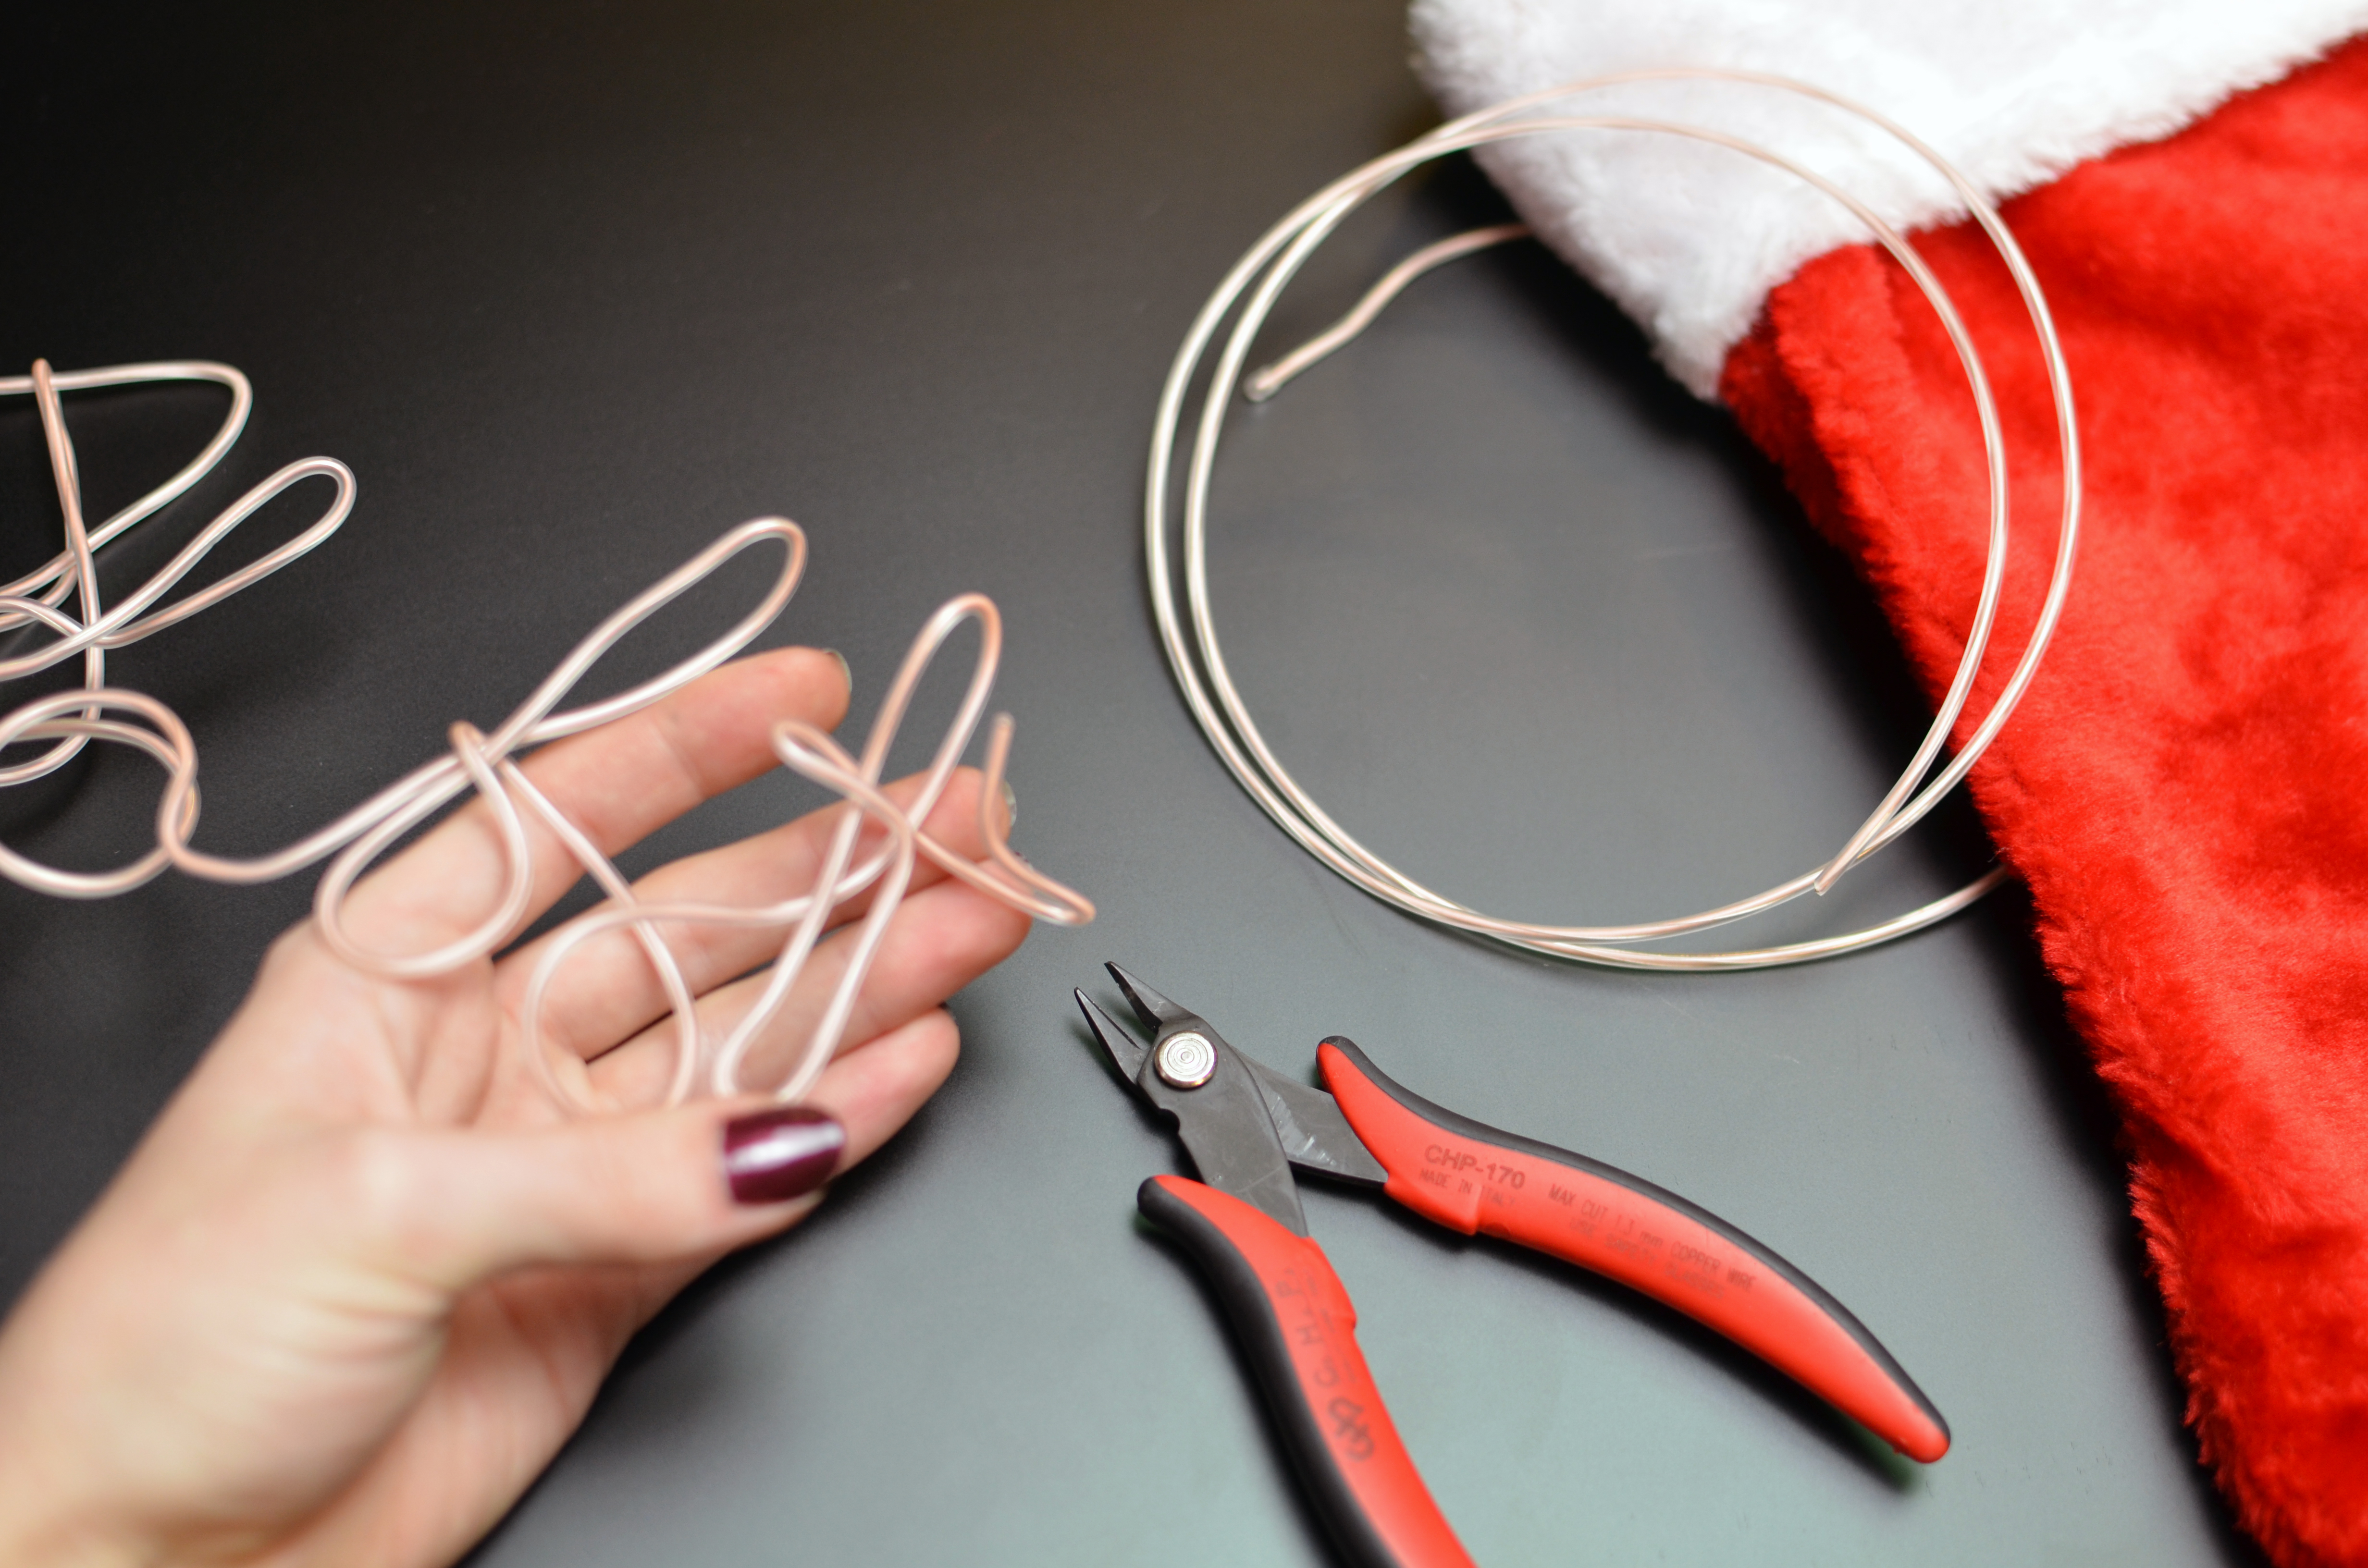 el_wire_tape_panel_el-wire-stocking-02.jpg